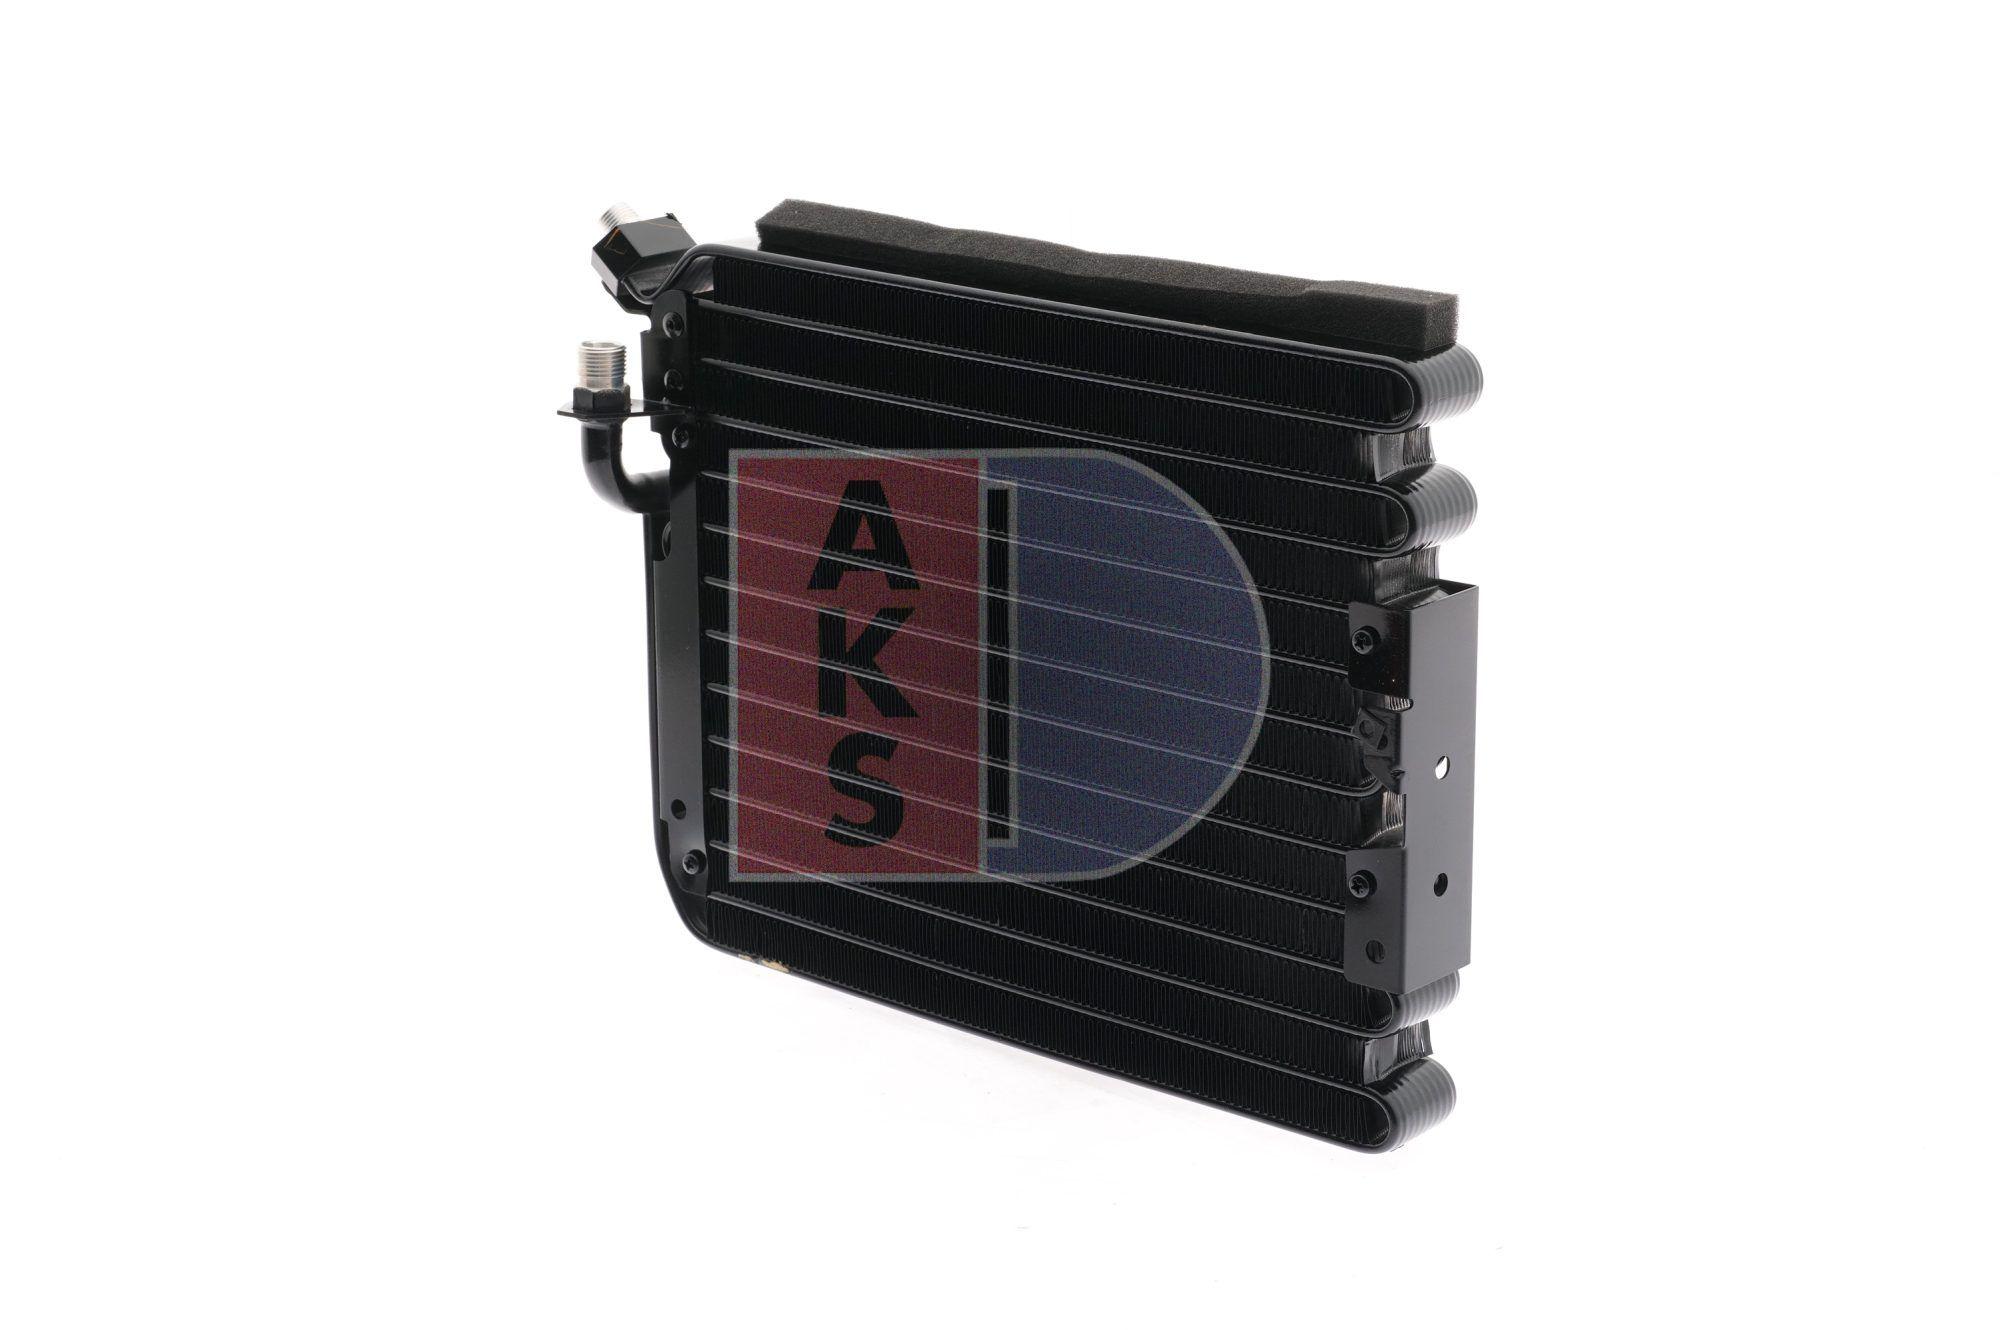 Klimakondensator 172060N AKS DASIS 172060N in Original Qualität